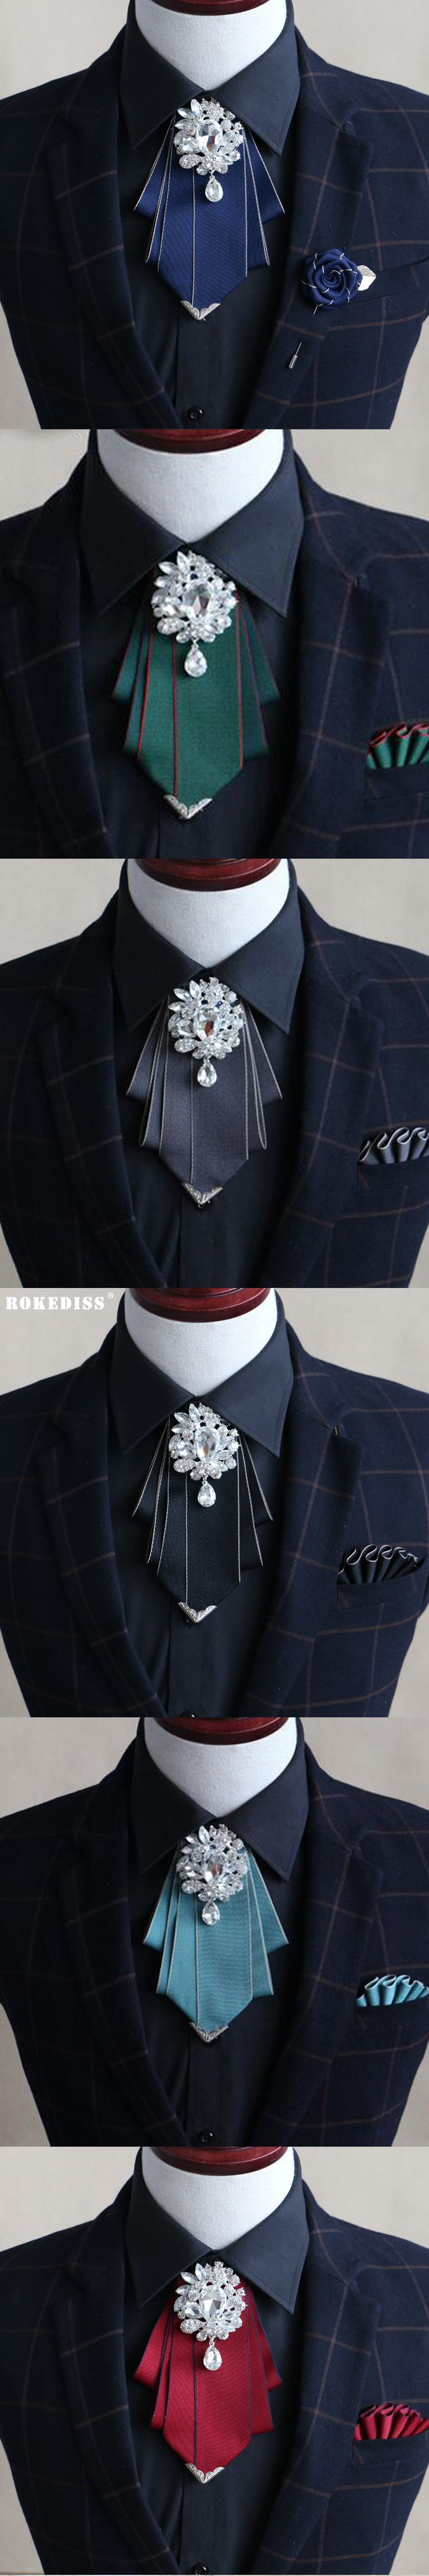 ROKEDISS 2017 groom groom wedding uniforms wedding tie British wedding dress collar men dress up high-grade diamond bow tie Z267